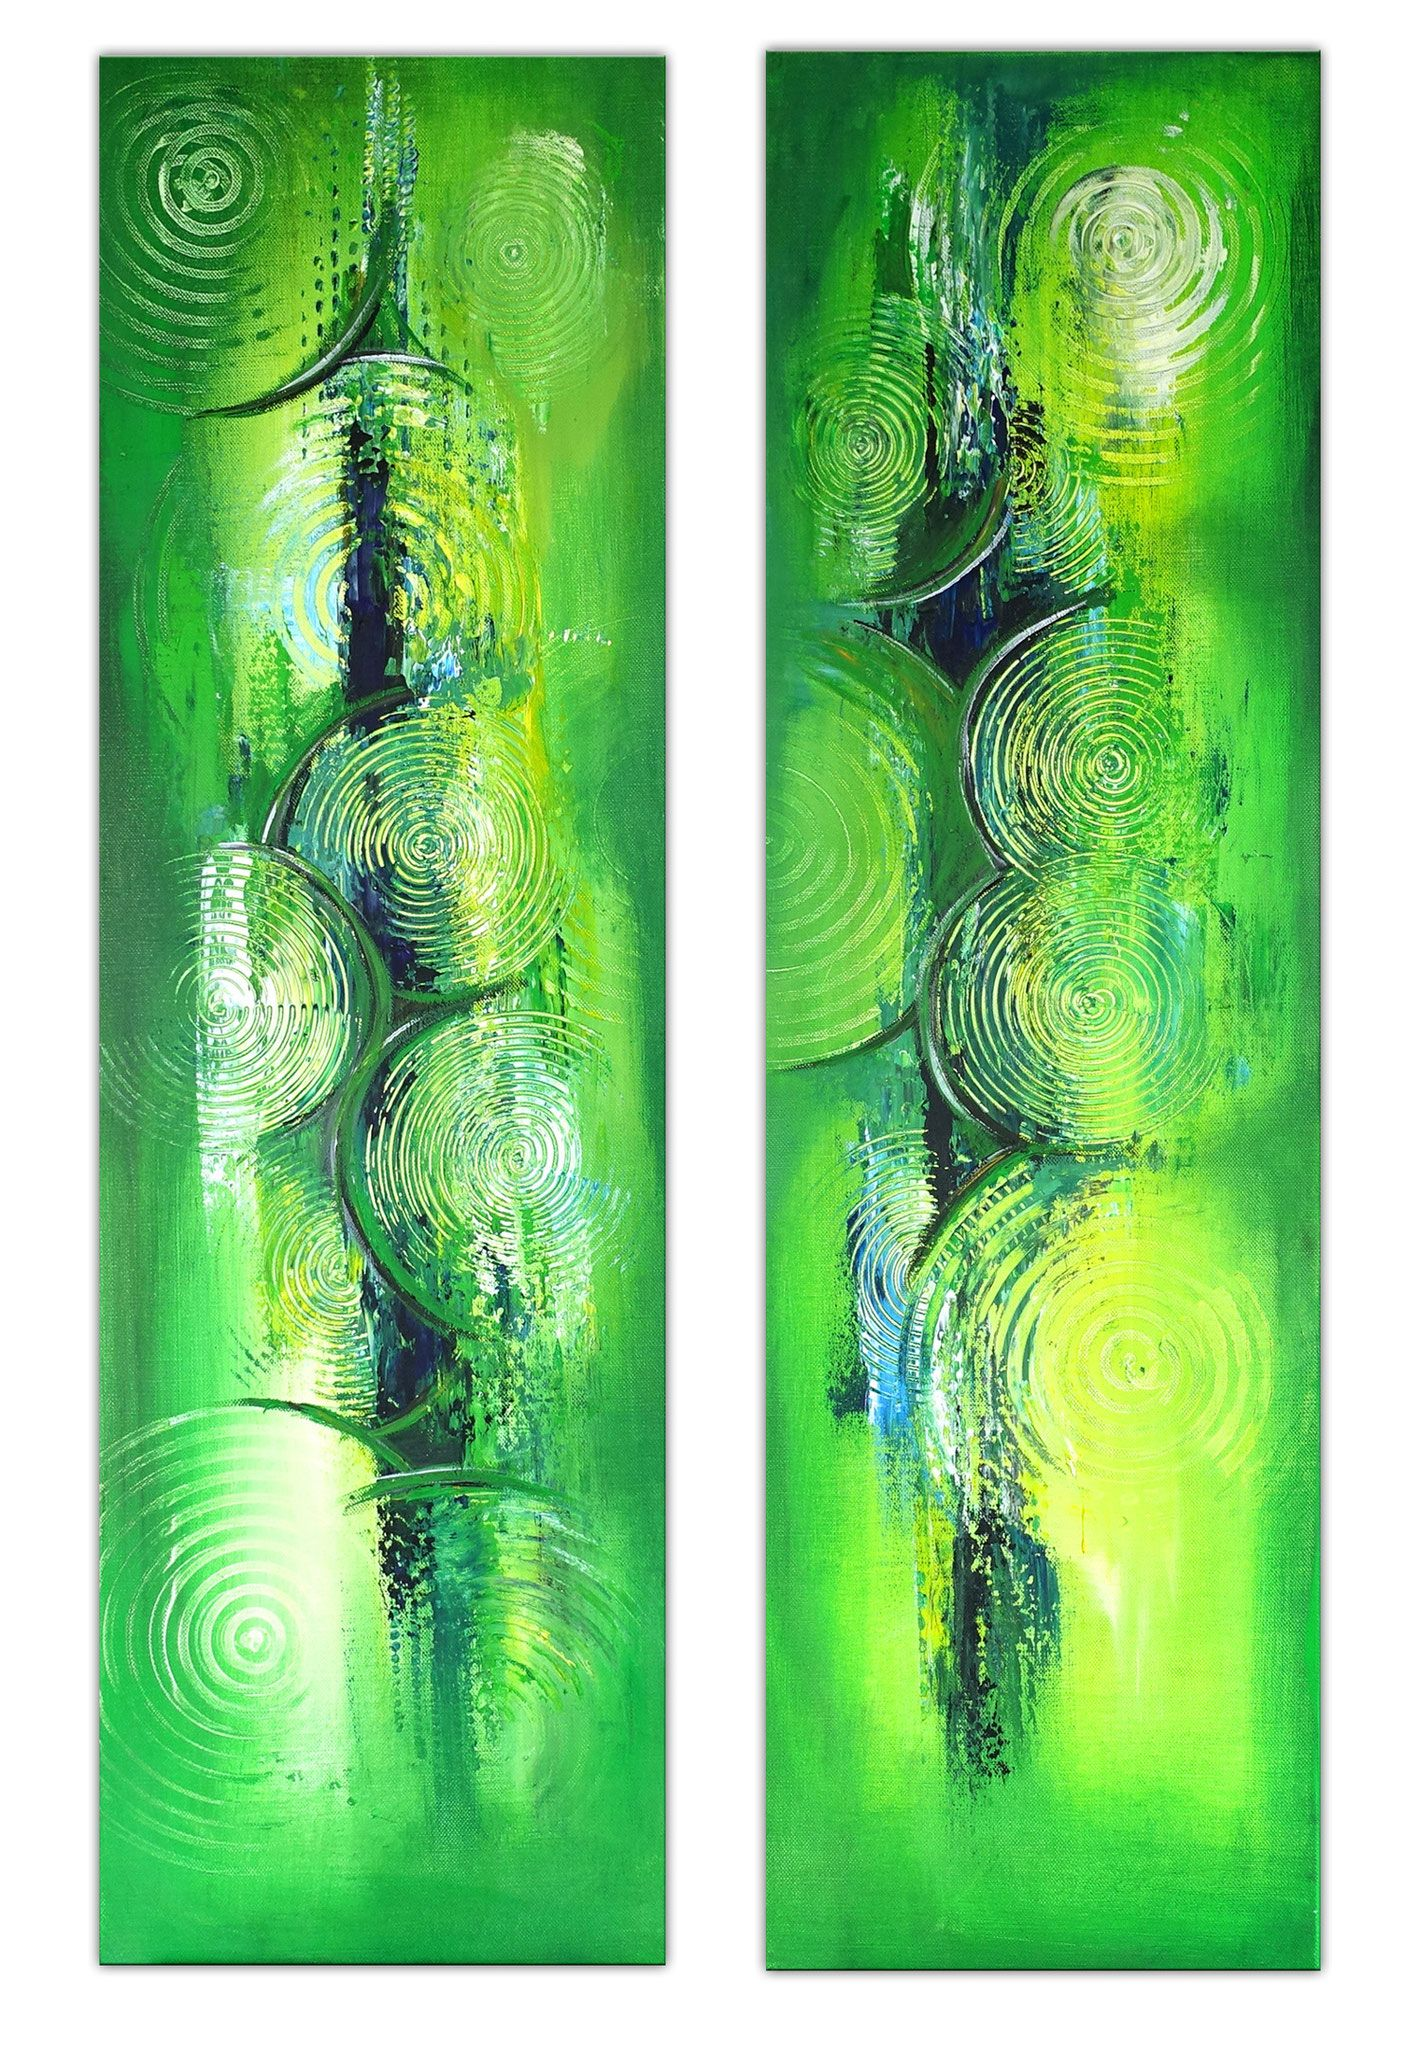 wandbilder grun abstraktes acrylgemalde zweiteilig hochformat 3 4 k wandbild abstrakt leinwand drucken lassen kunstdrucke großformat